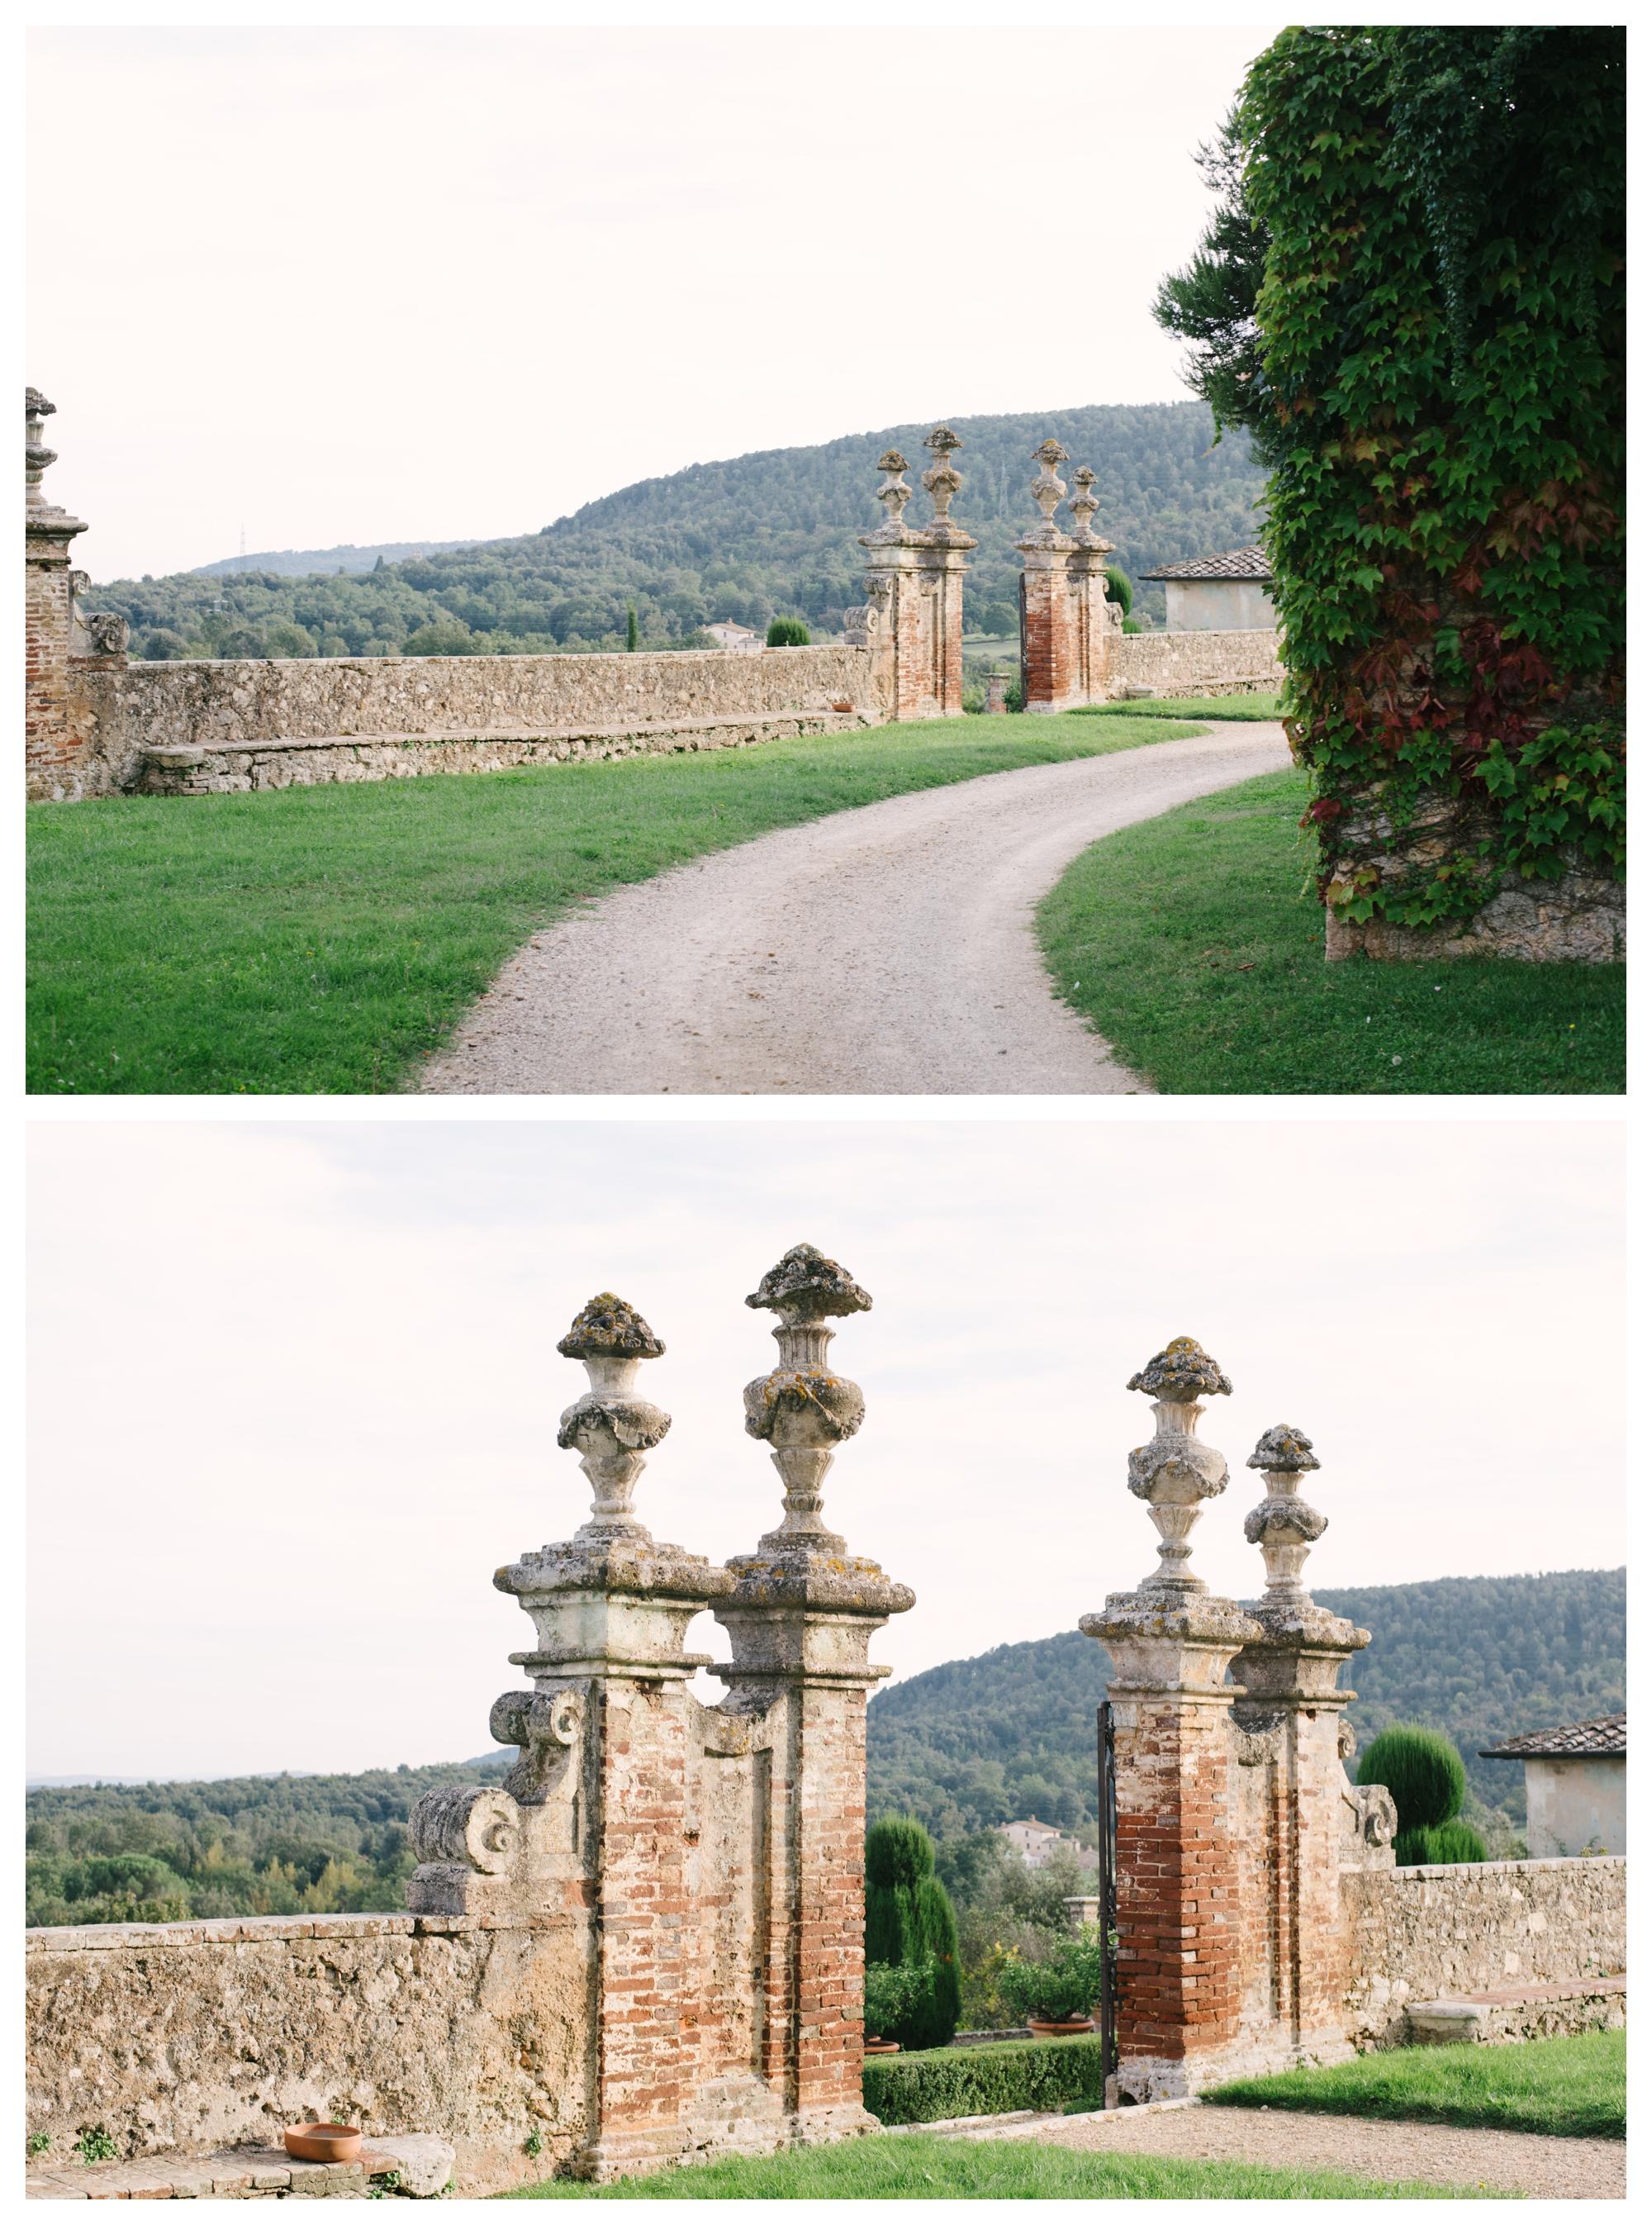 tuscany-castle-wedding-photographer-italy-williamsburgphotostudios-_0007.jpg